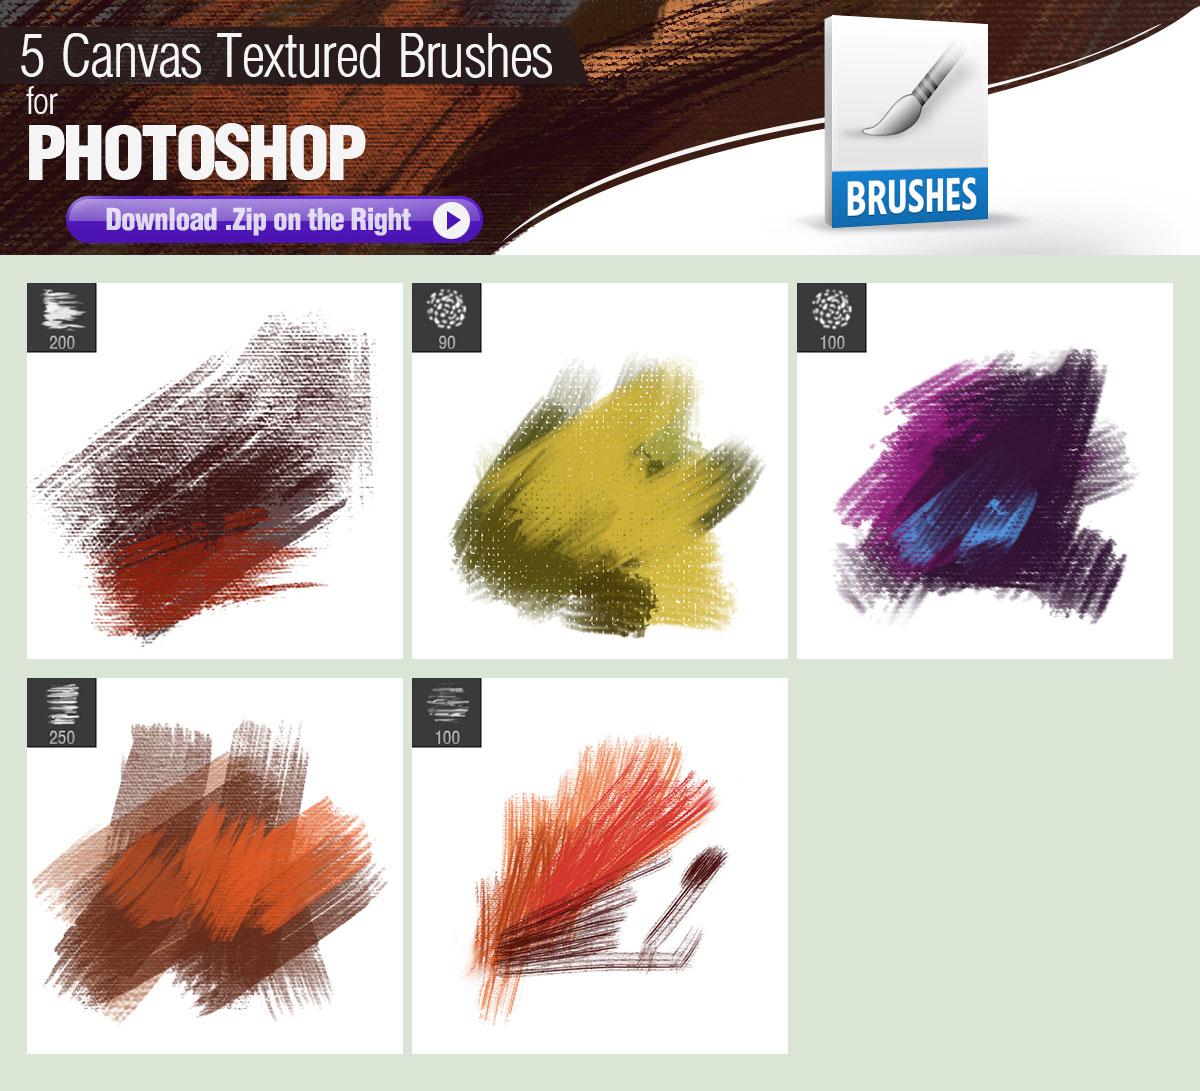 Canvas Textured PS Brushes - Photoshop brushes